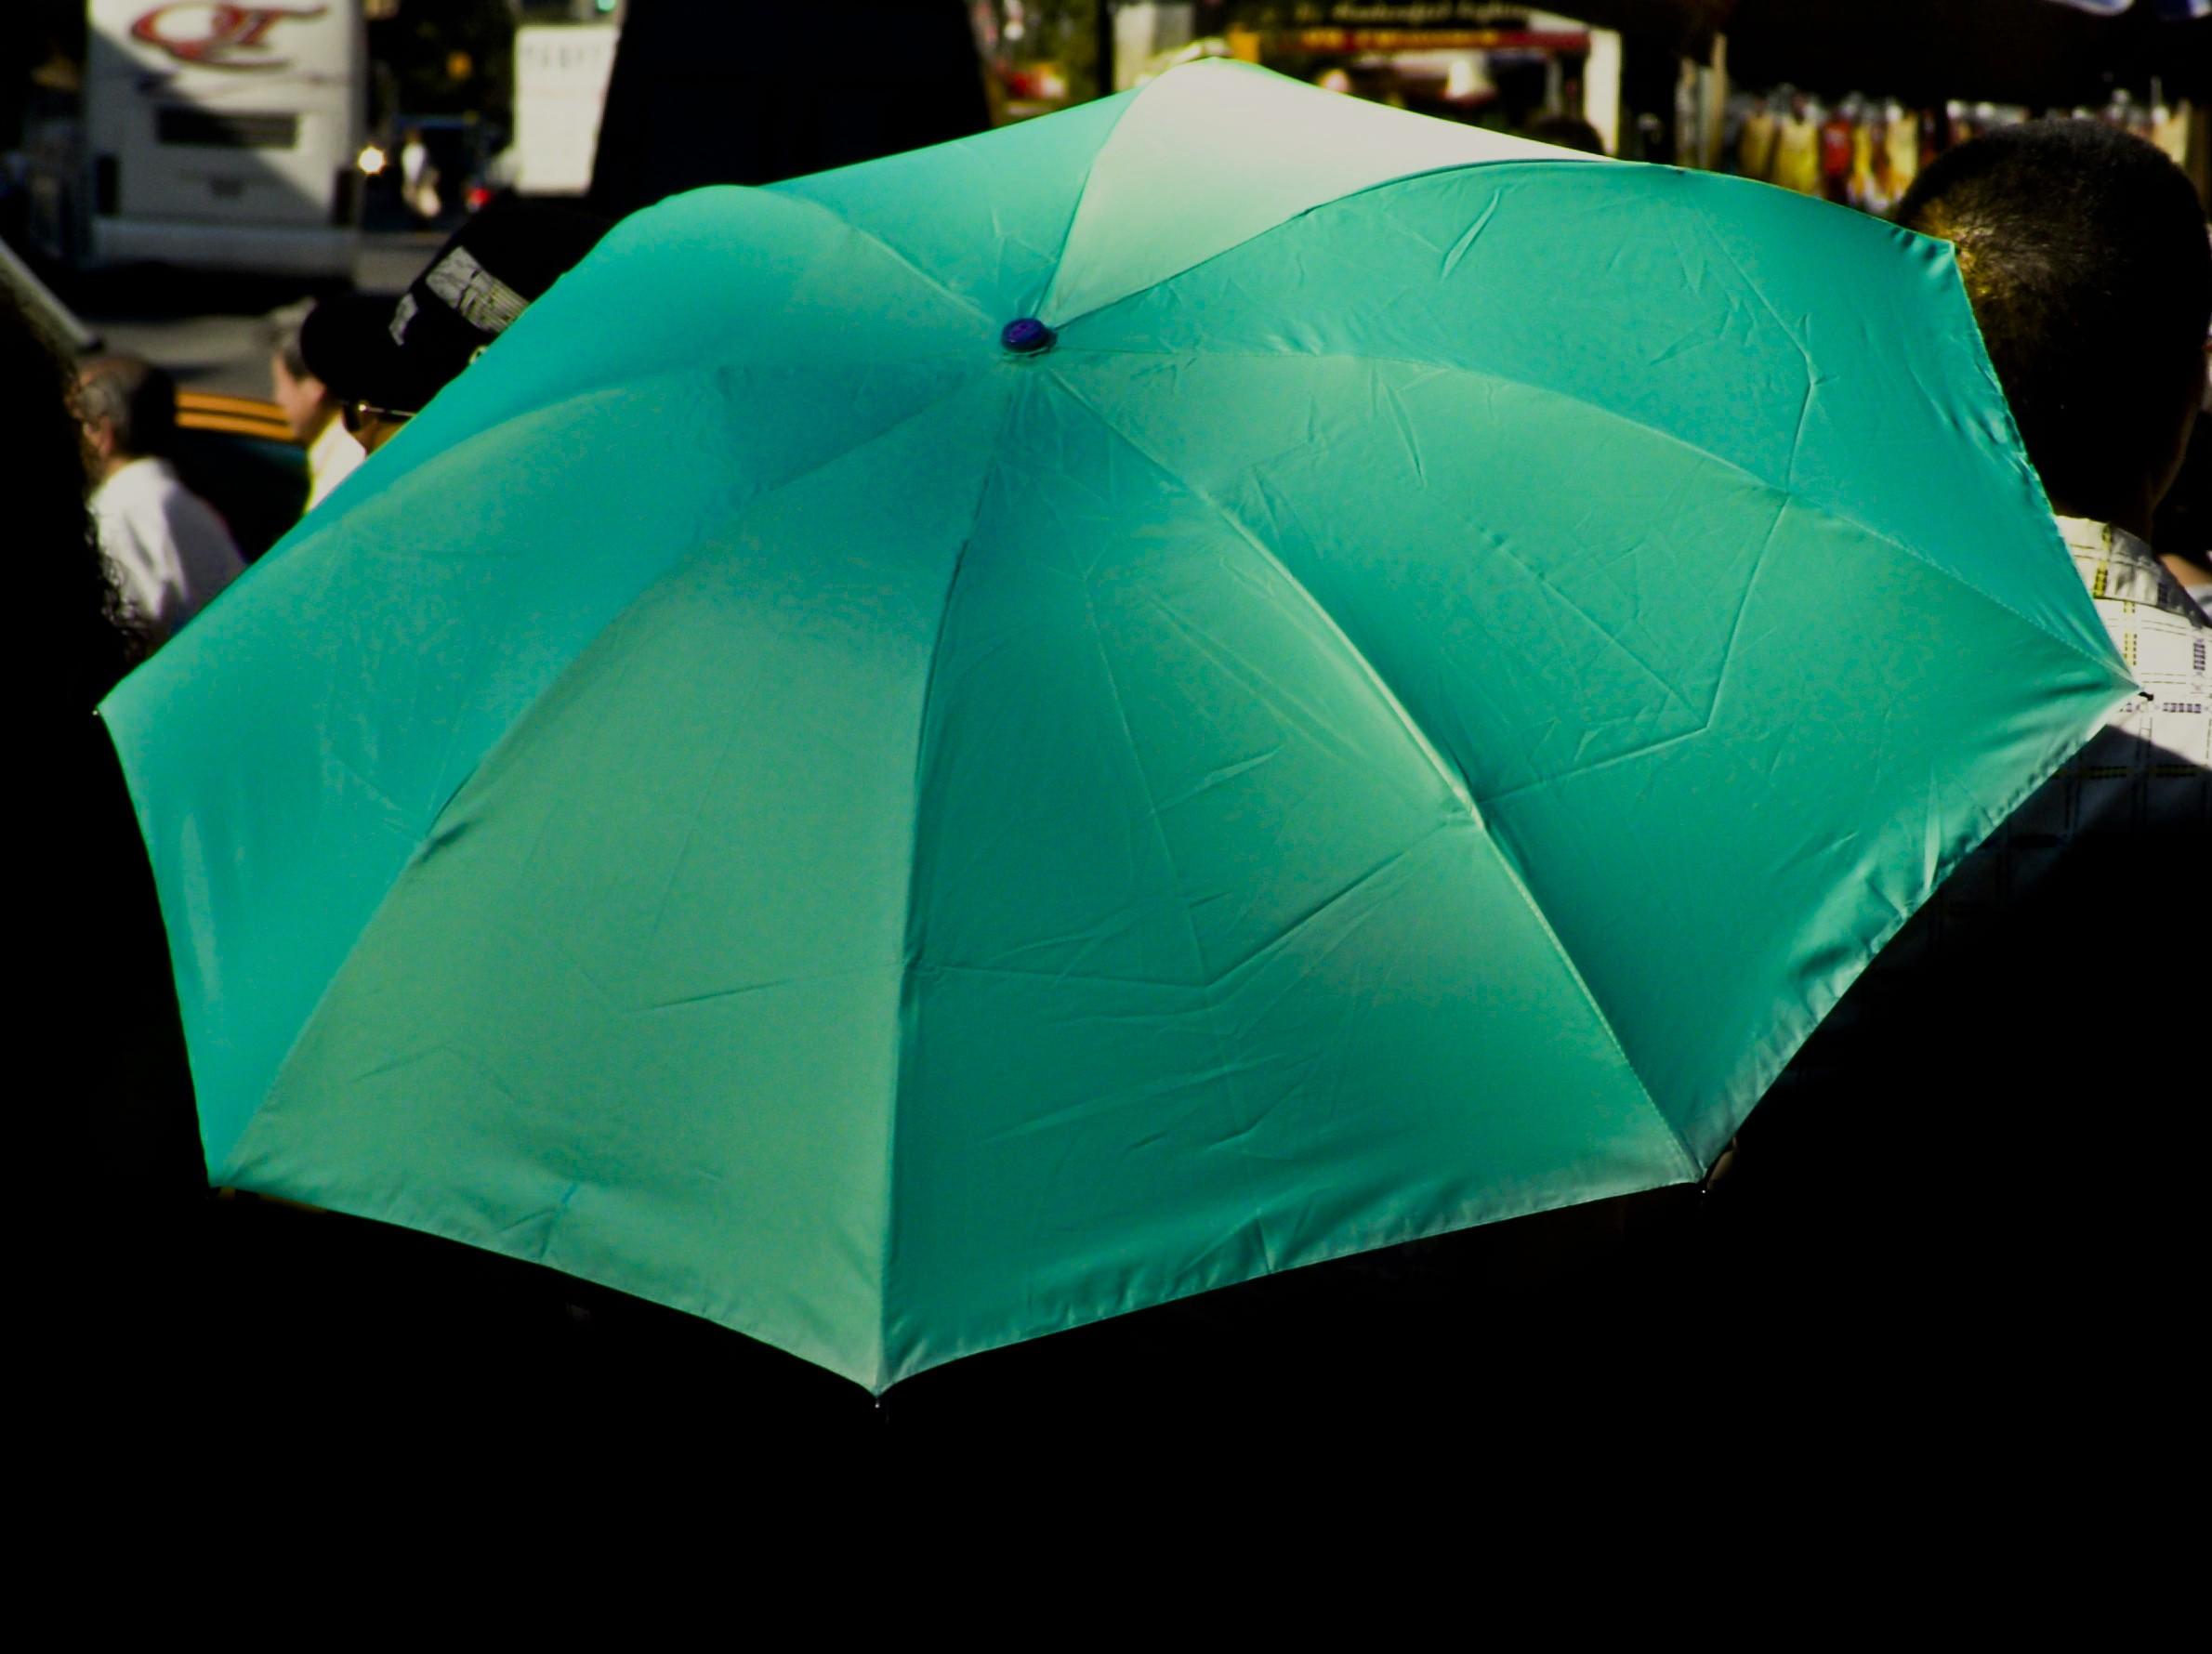 Umbrella Manufacturing Company in Bangladesh